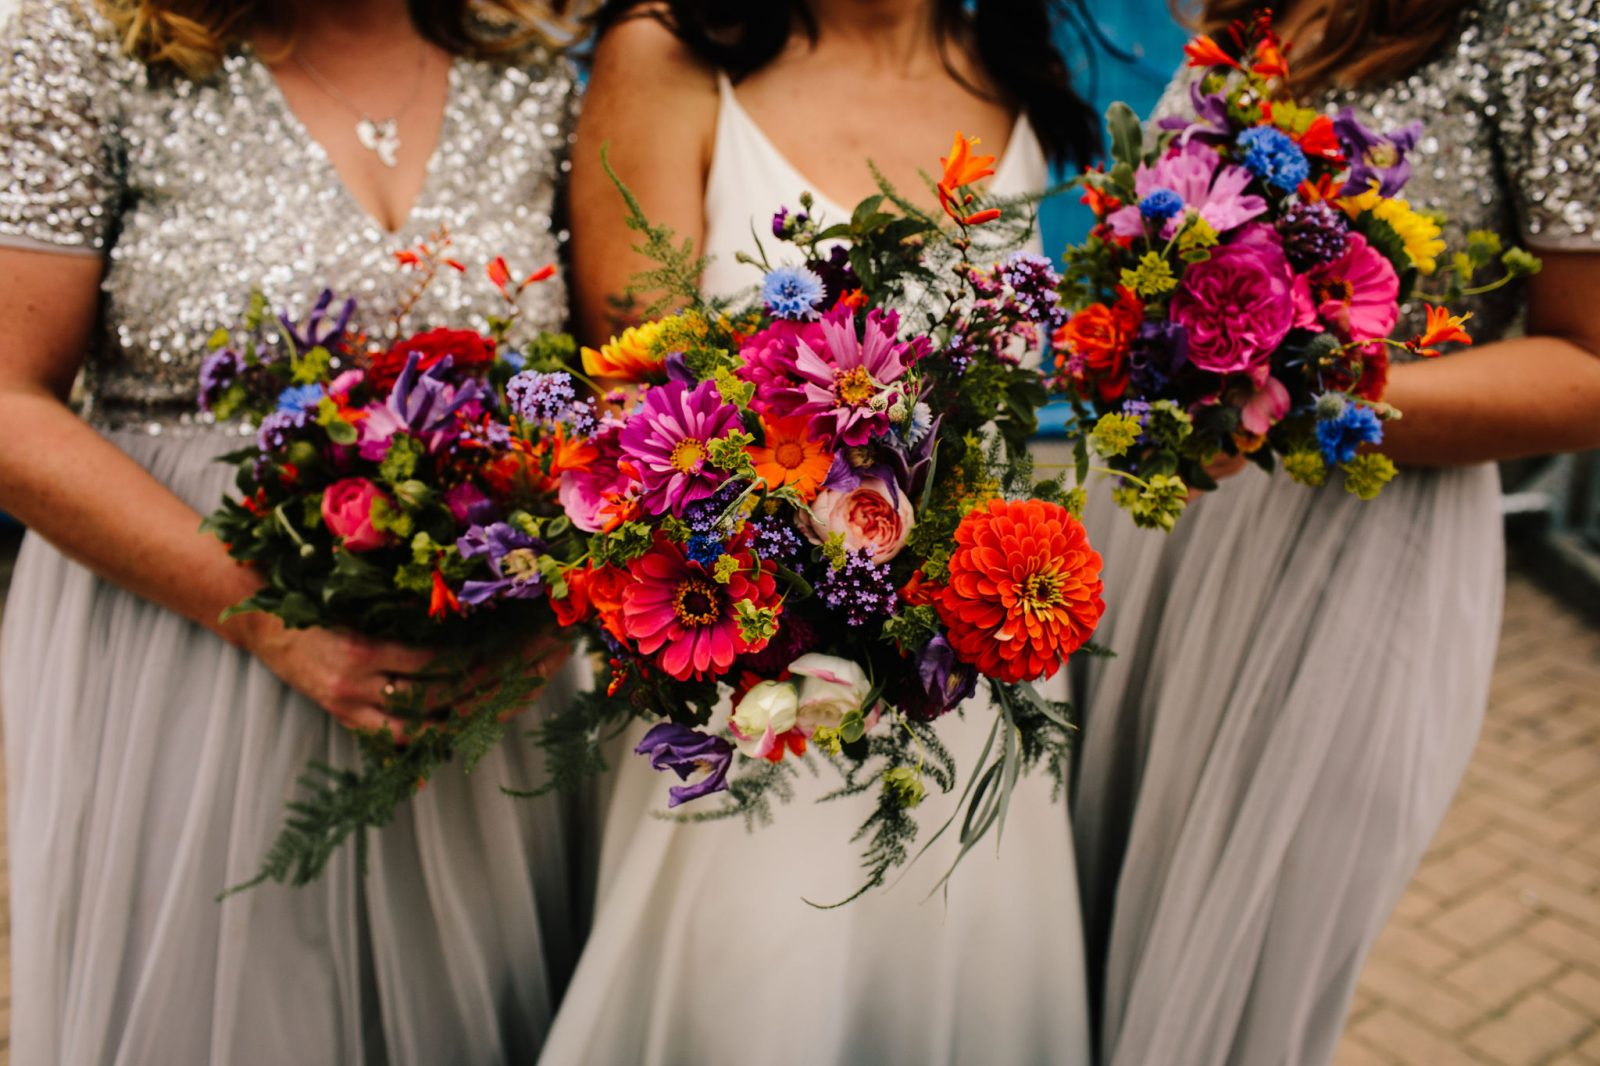 Brighton florist colourful wedding flowers